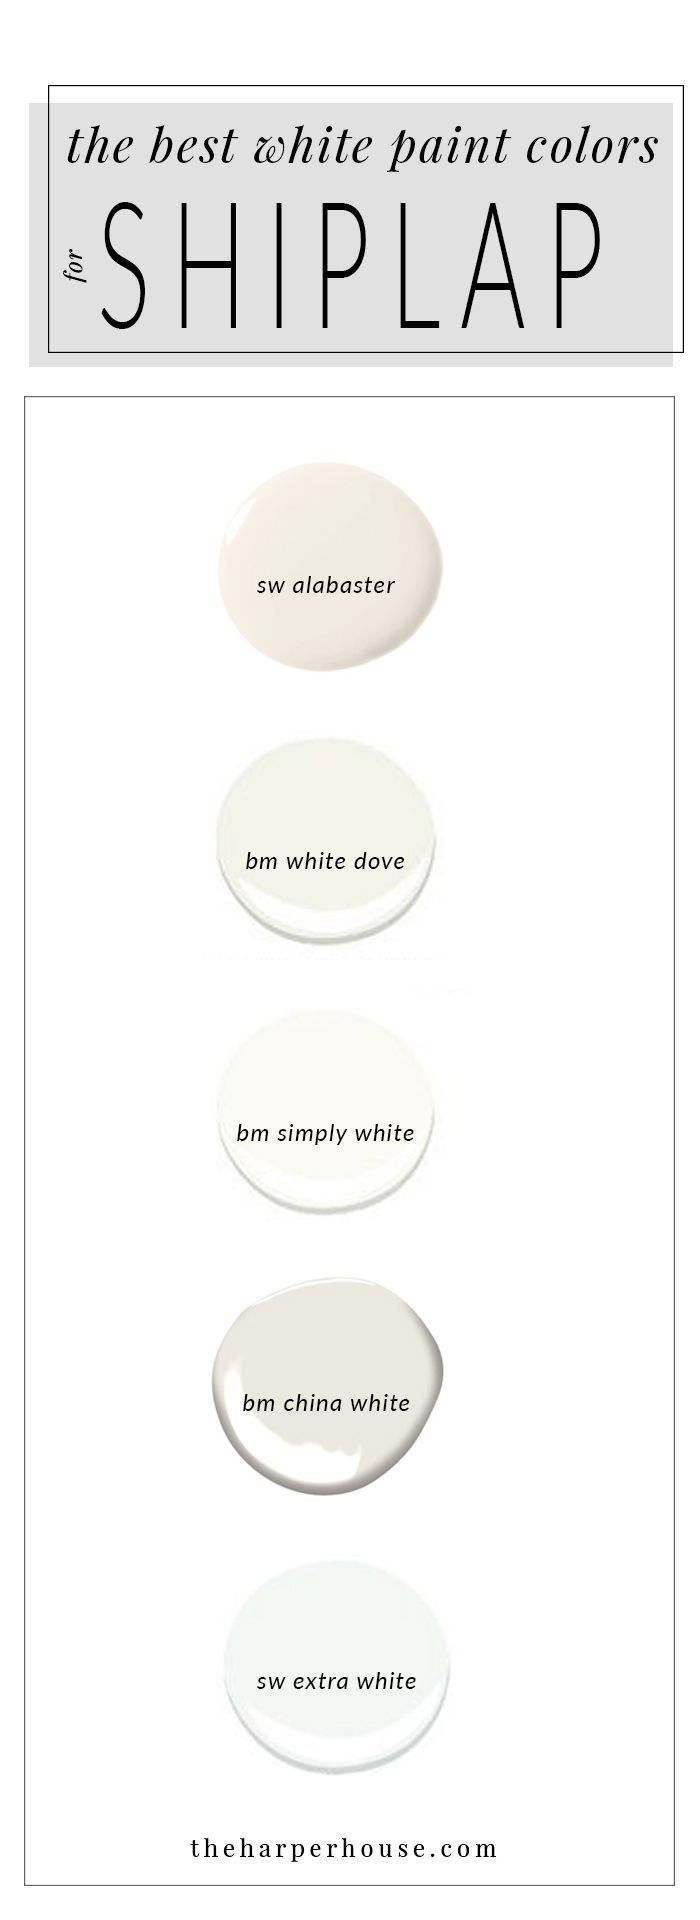 White Paint Colors: 5 Favorites for Shiplap